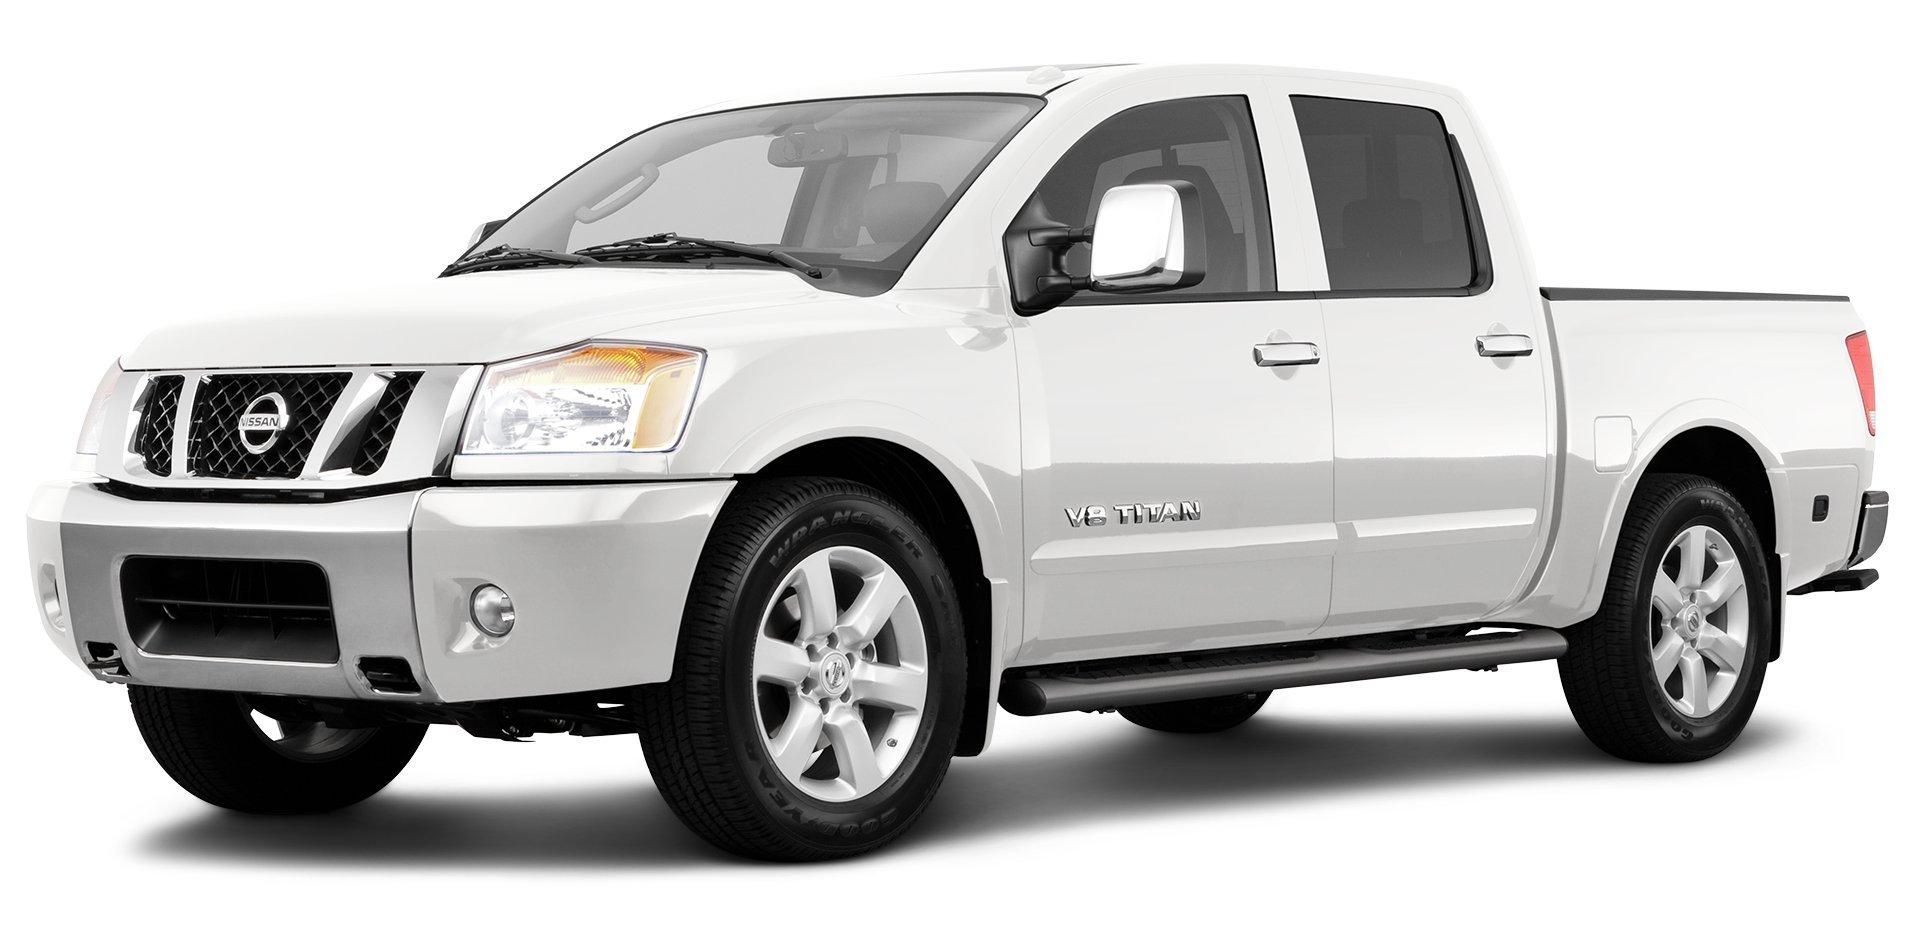 2011 Nissan Titan PRO-4X, 4-Wheel Drive Crew Cab Short Wheelbase ...